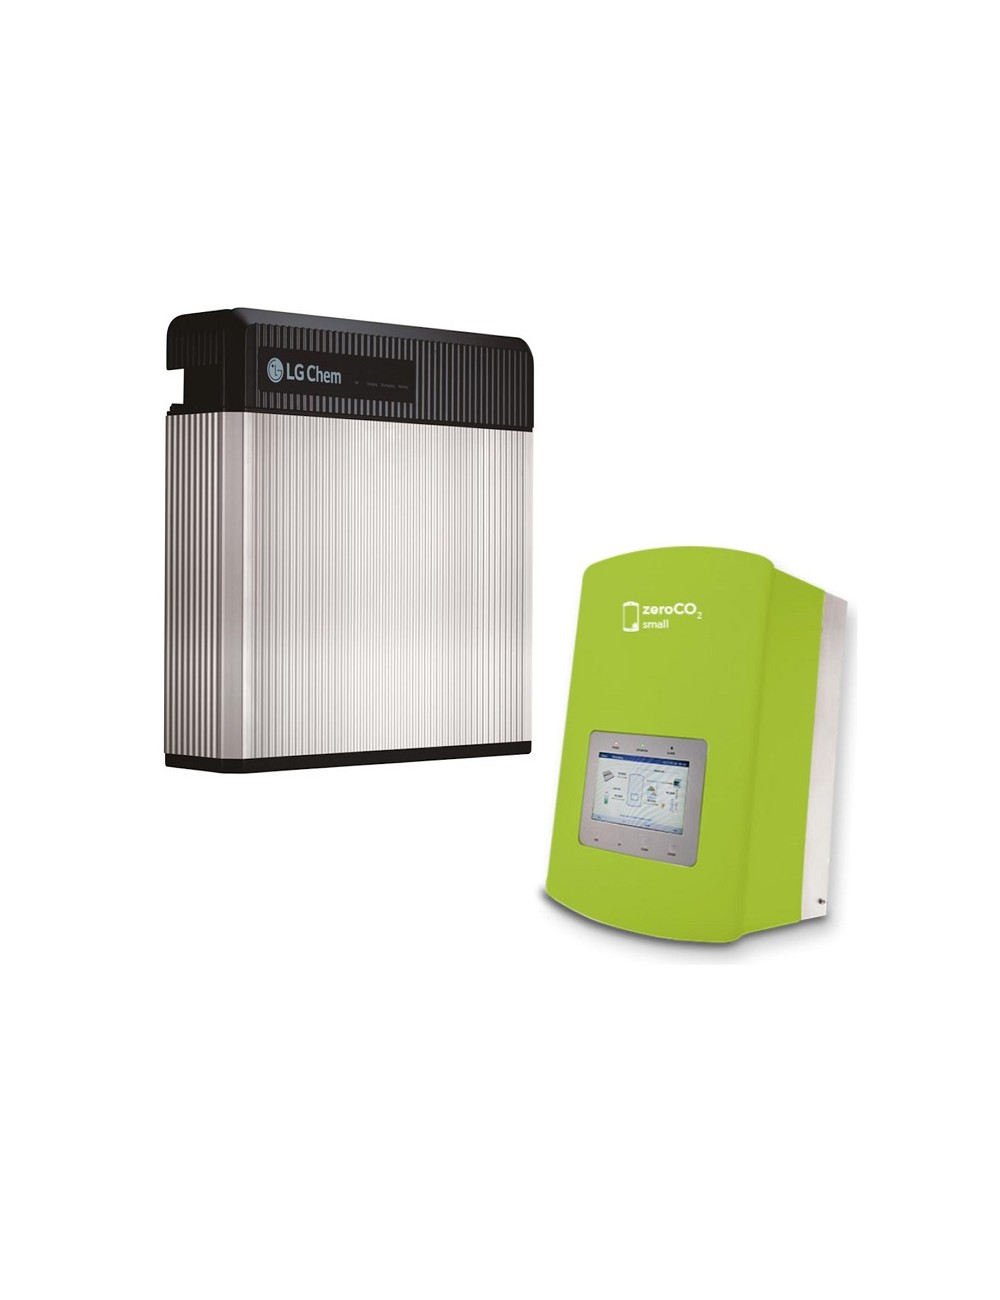 Batteria d'Accumulo Fotovoltaico 9,8 kWh LG Chem RESU10 Kit Retrofit e Inverter Ibrido Monofase 5 kW Solis ZeroCO2 Small